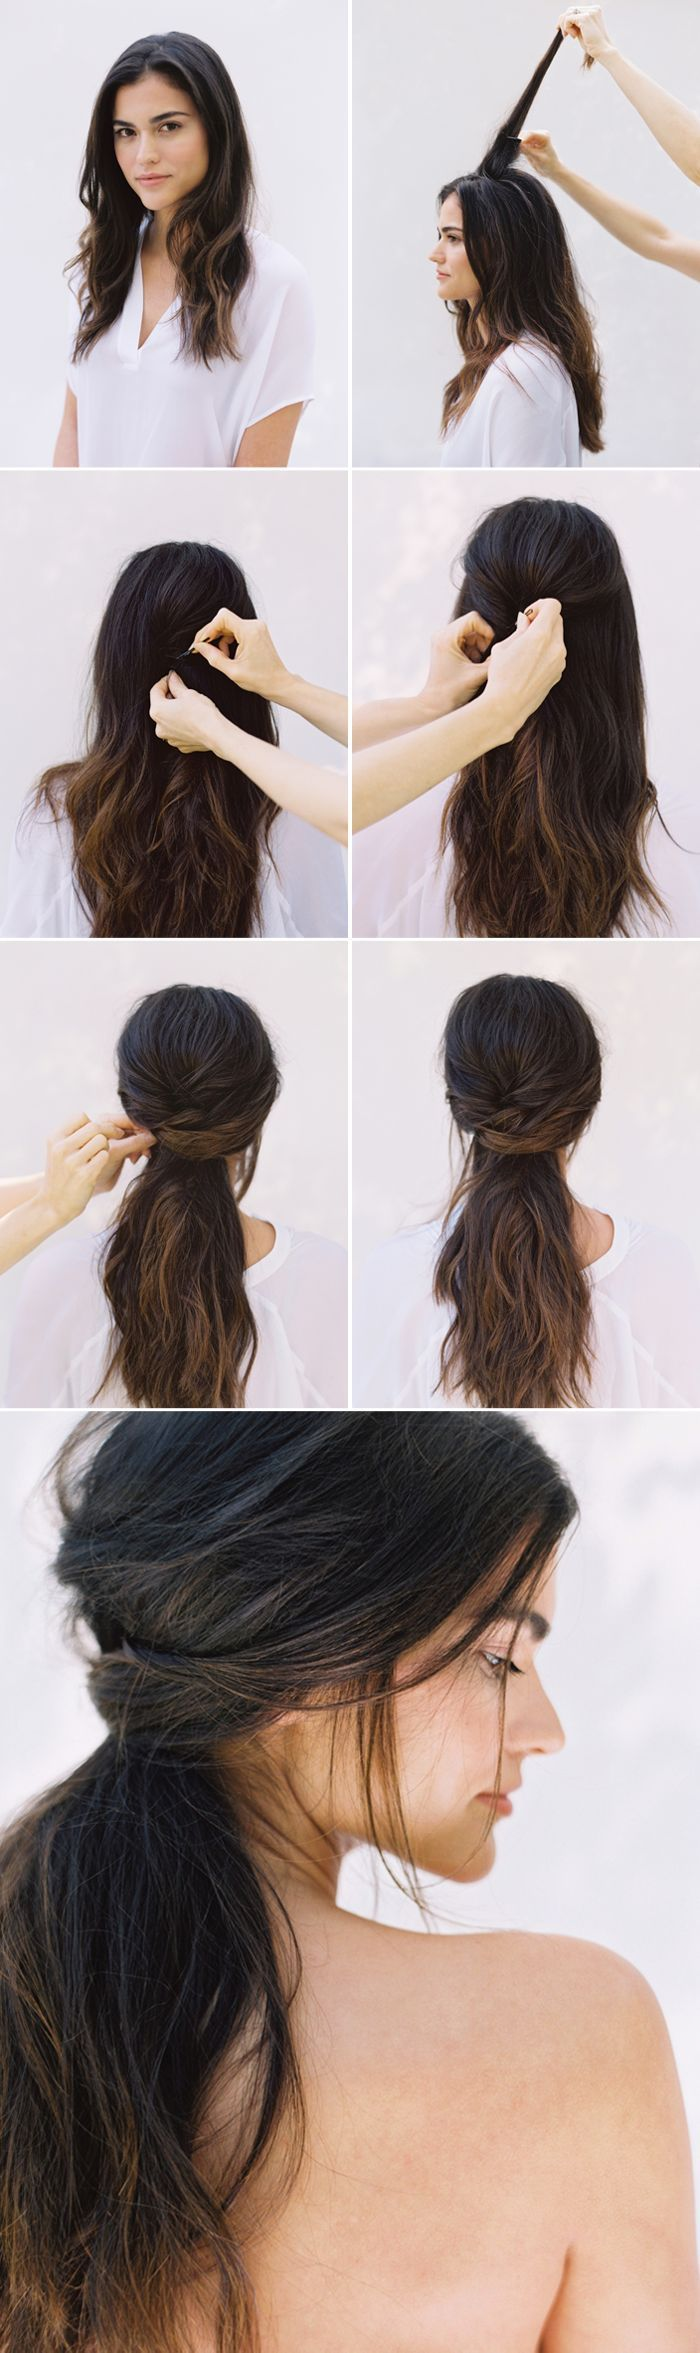 Marvelous 1000 Ideas About Easy Wedding Hairstyles On Pinterest Wedding Short Hairstyles For Black Women Fulllsitofus